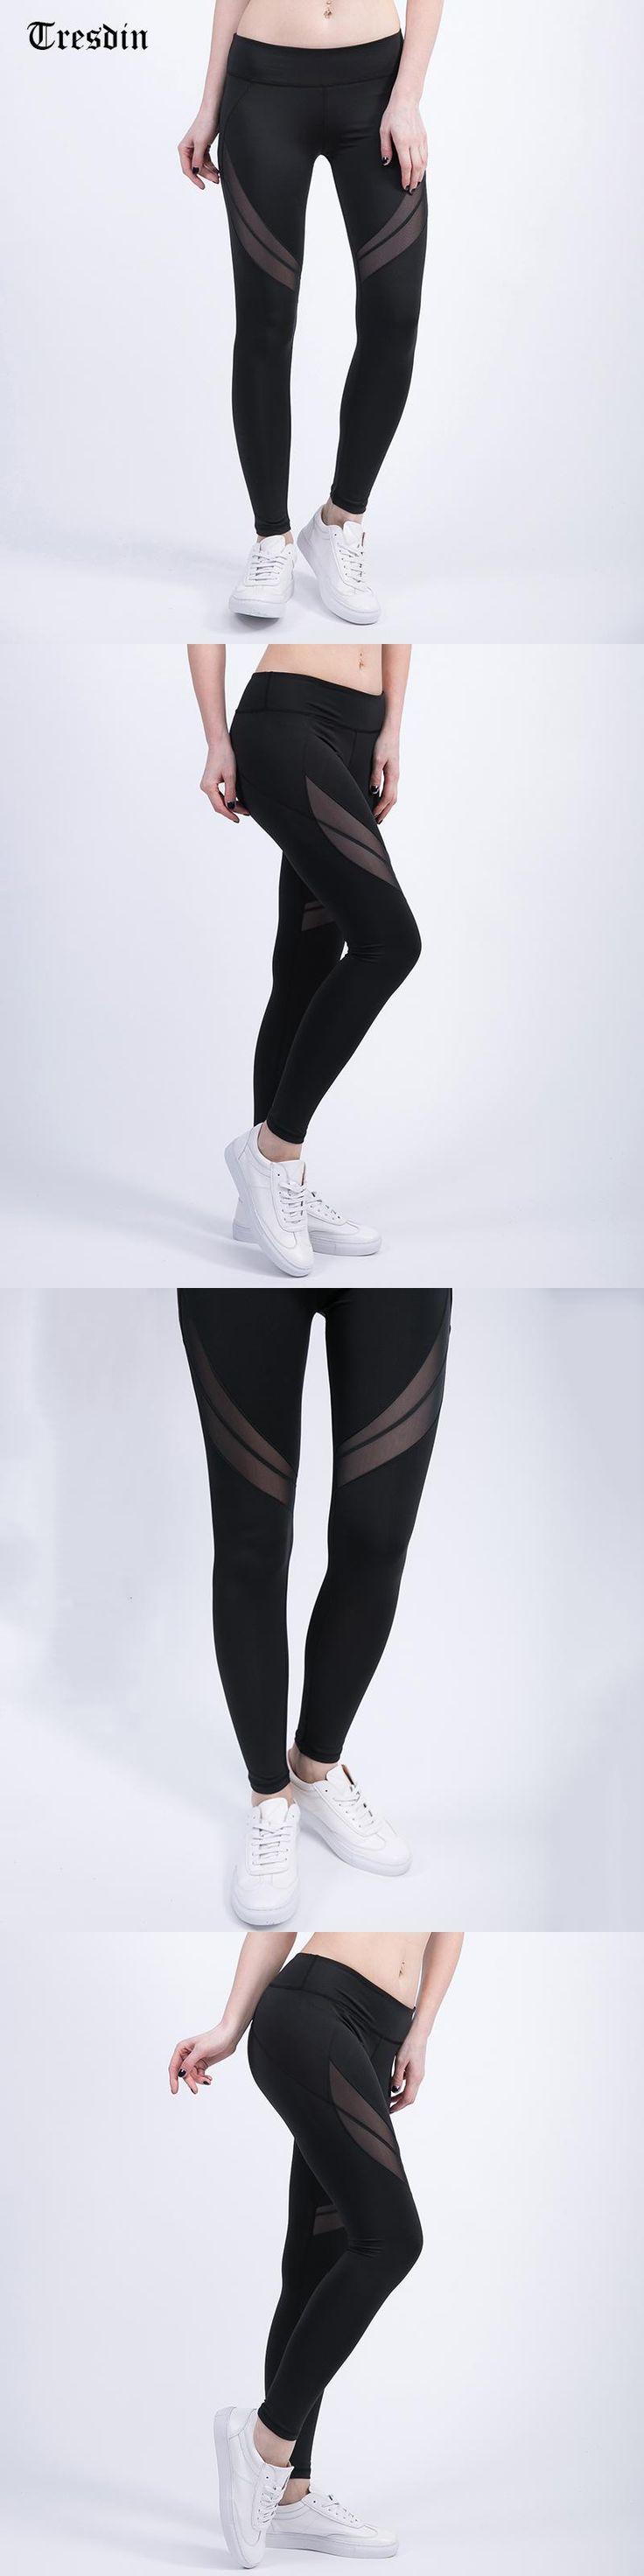 Tresdin Mesh Splice Women Leggings Athleisure Sexy Ladies Summer Long Trousers Elastic Women Clothes Black Workout Slim Pants